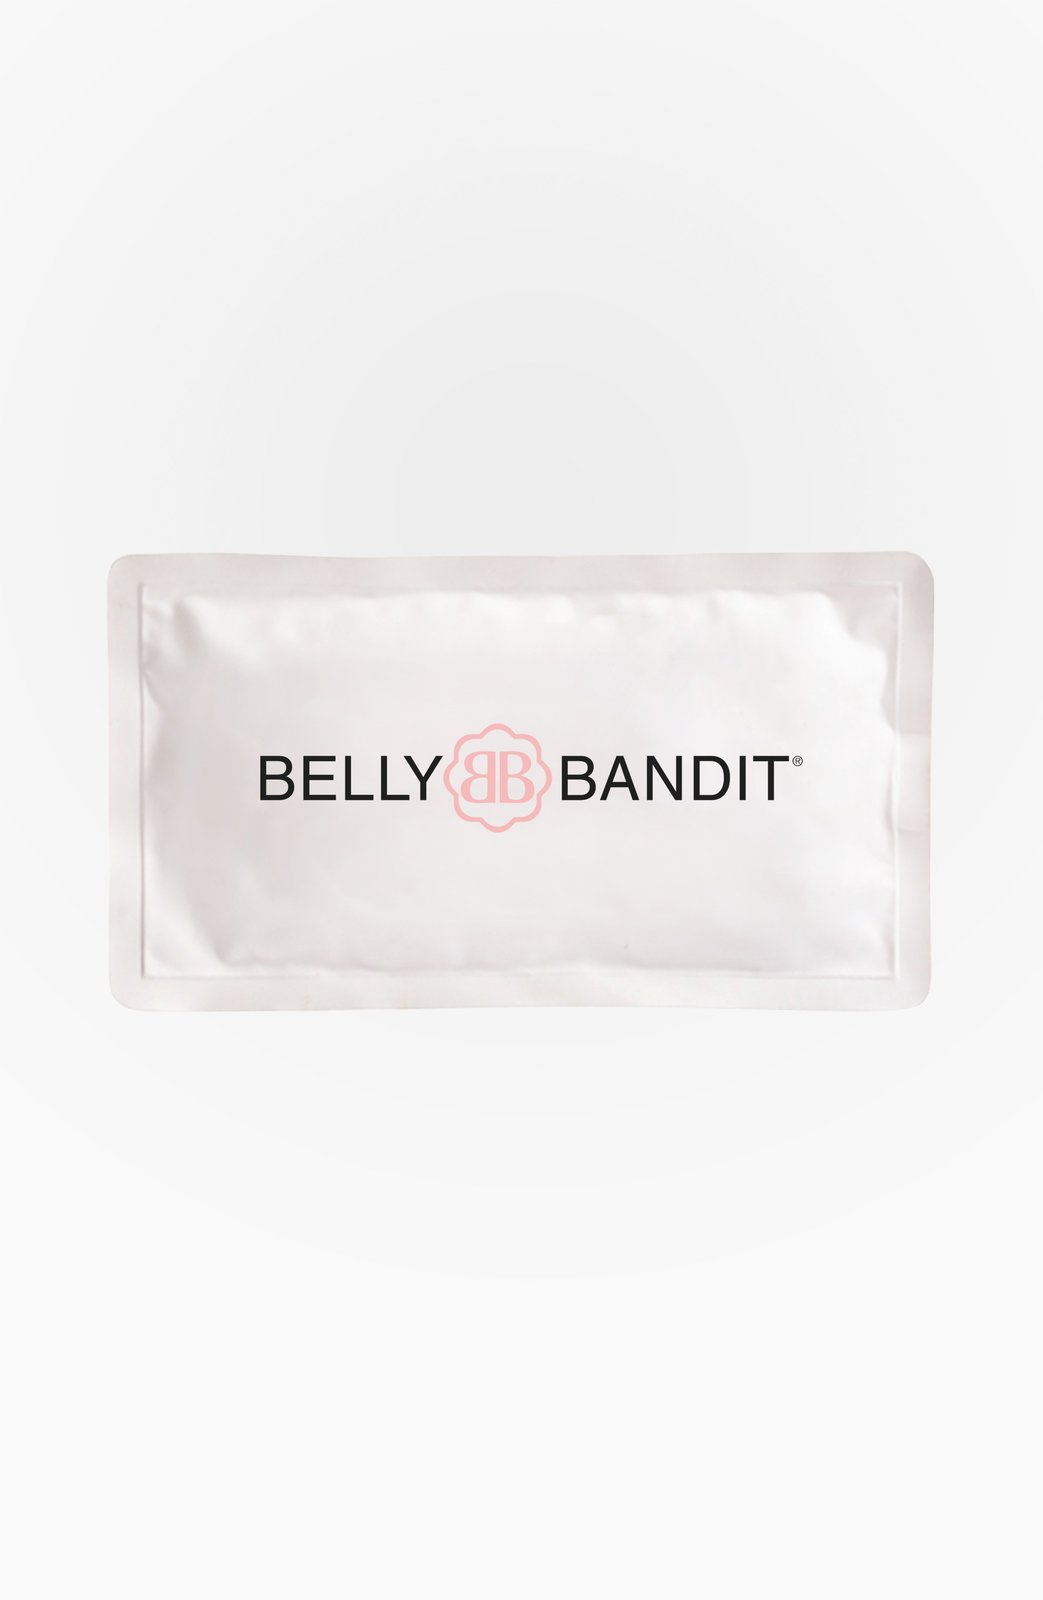 Belly Bandit: Upsie Belly - Black (Large) image